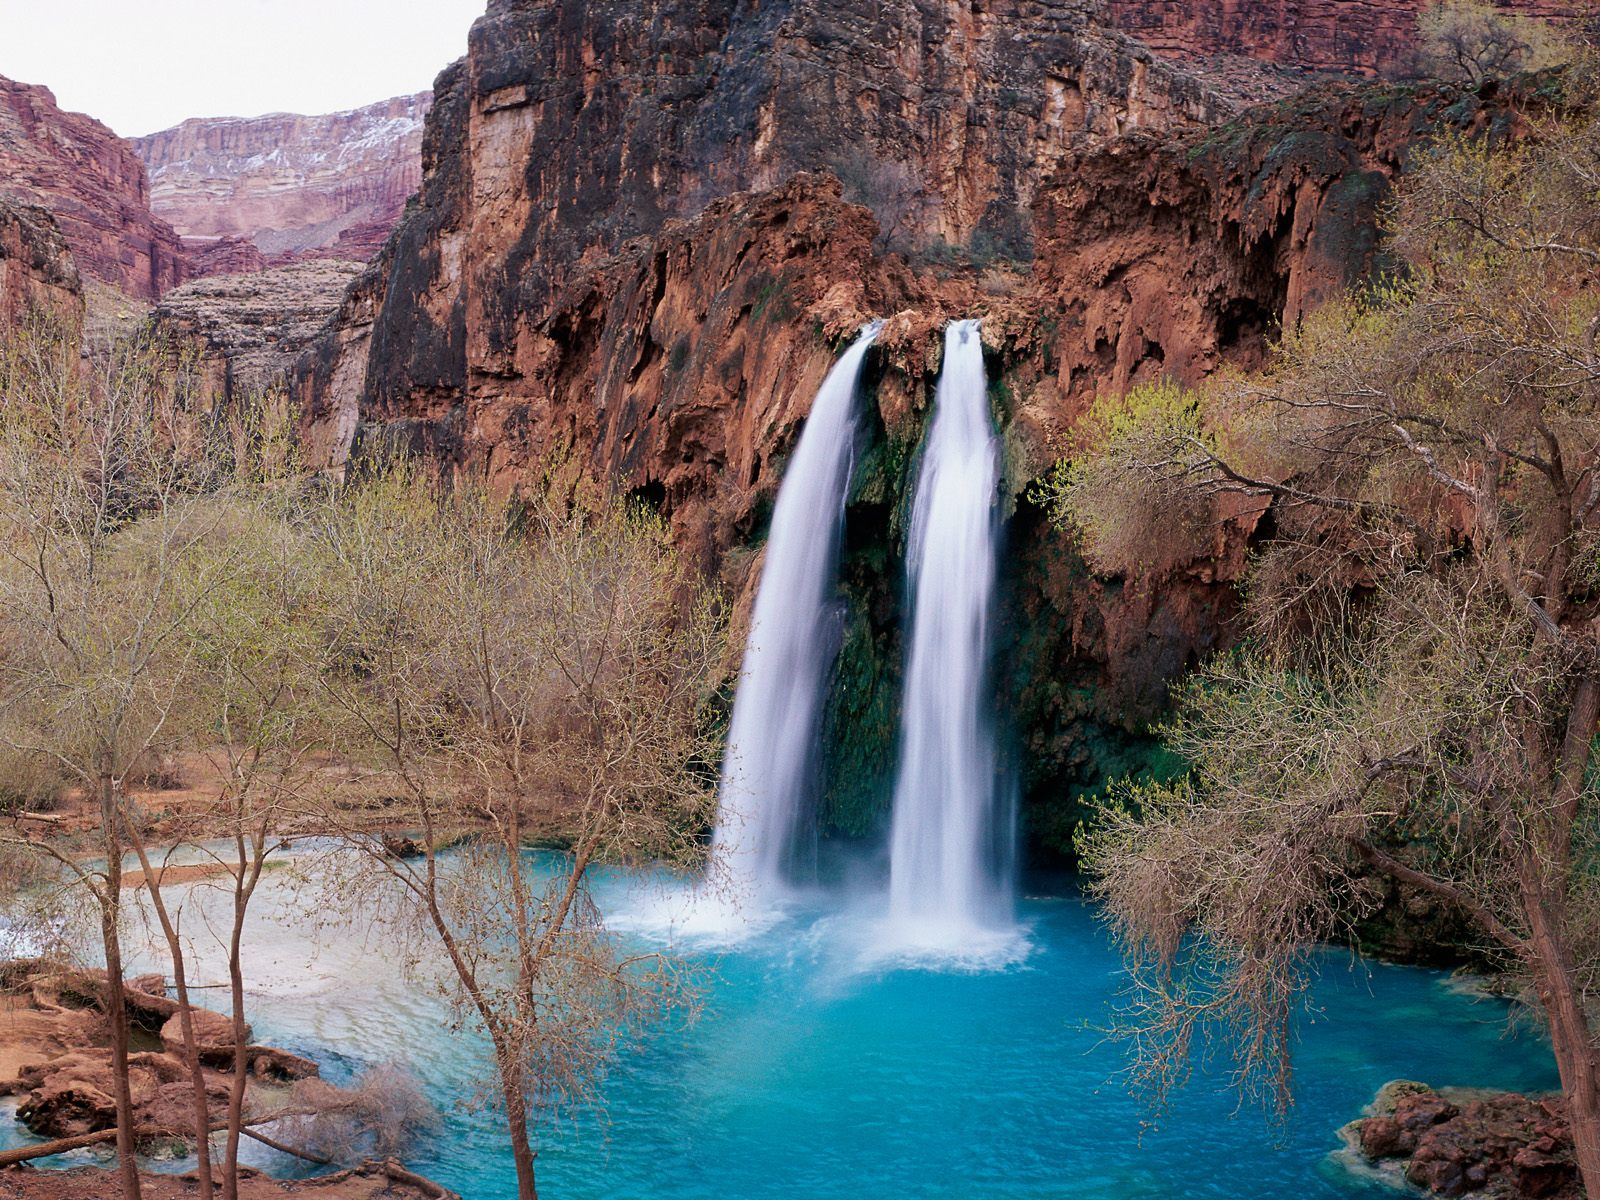 At The Beautiful Havasu Falls In Arizona HD Walls Find Wallpapers 1600x1200